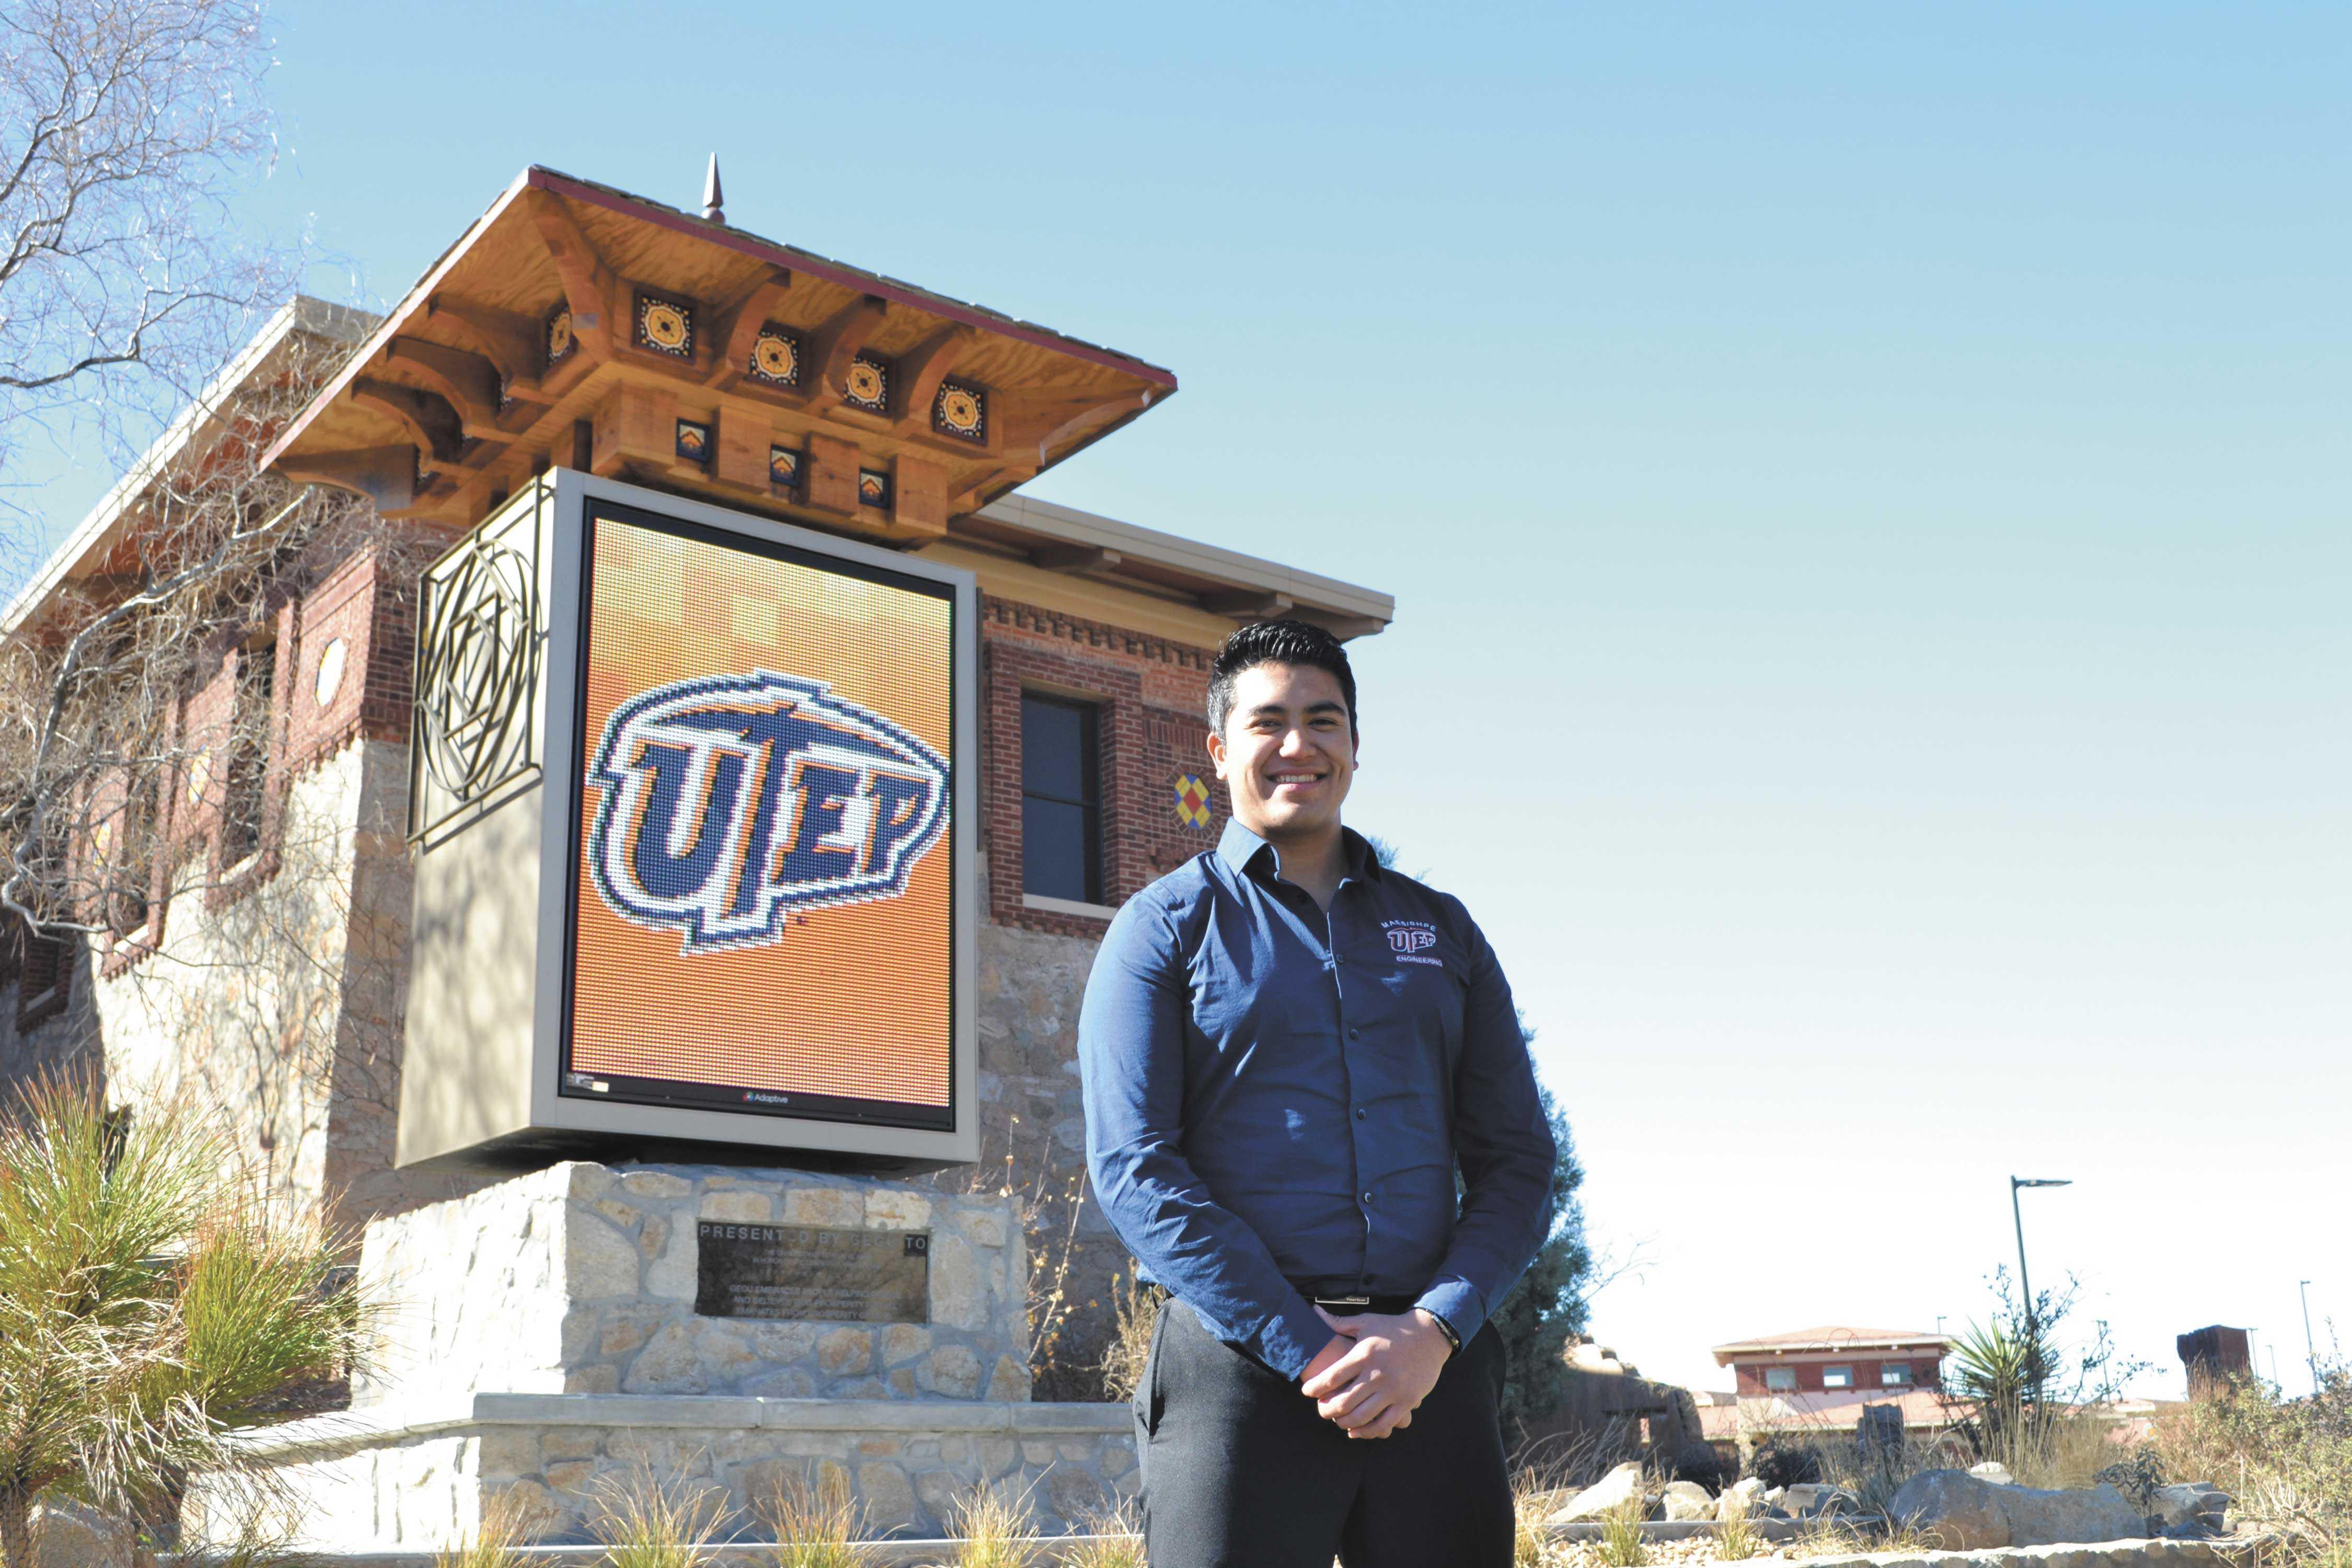 Jose Martinez, president of SHEP/MAES, junior mechanical engineering major.